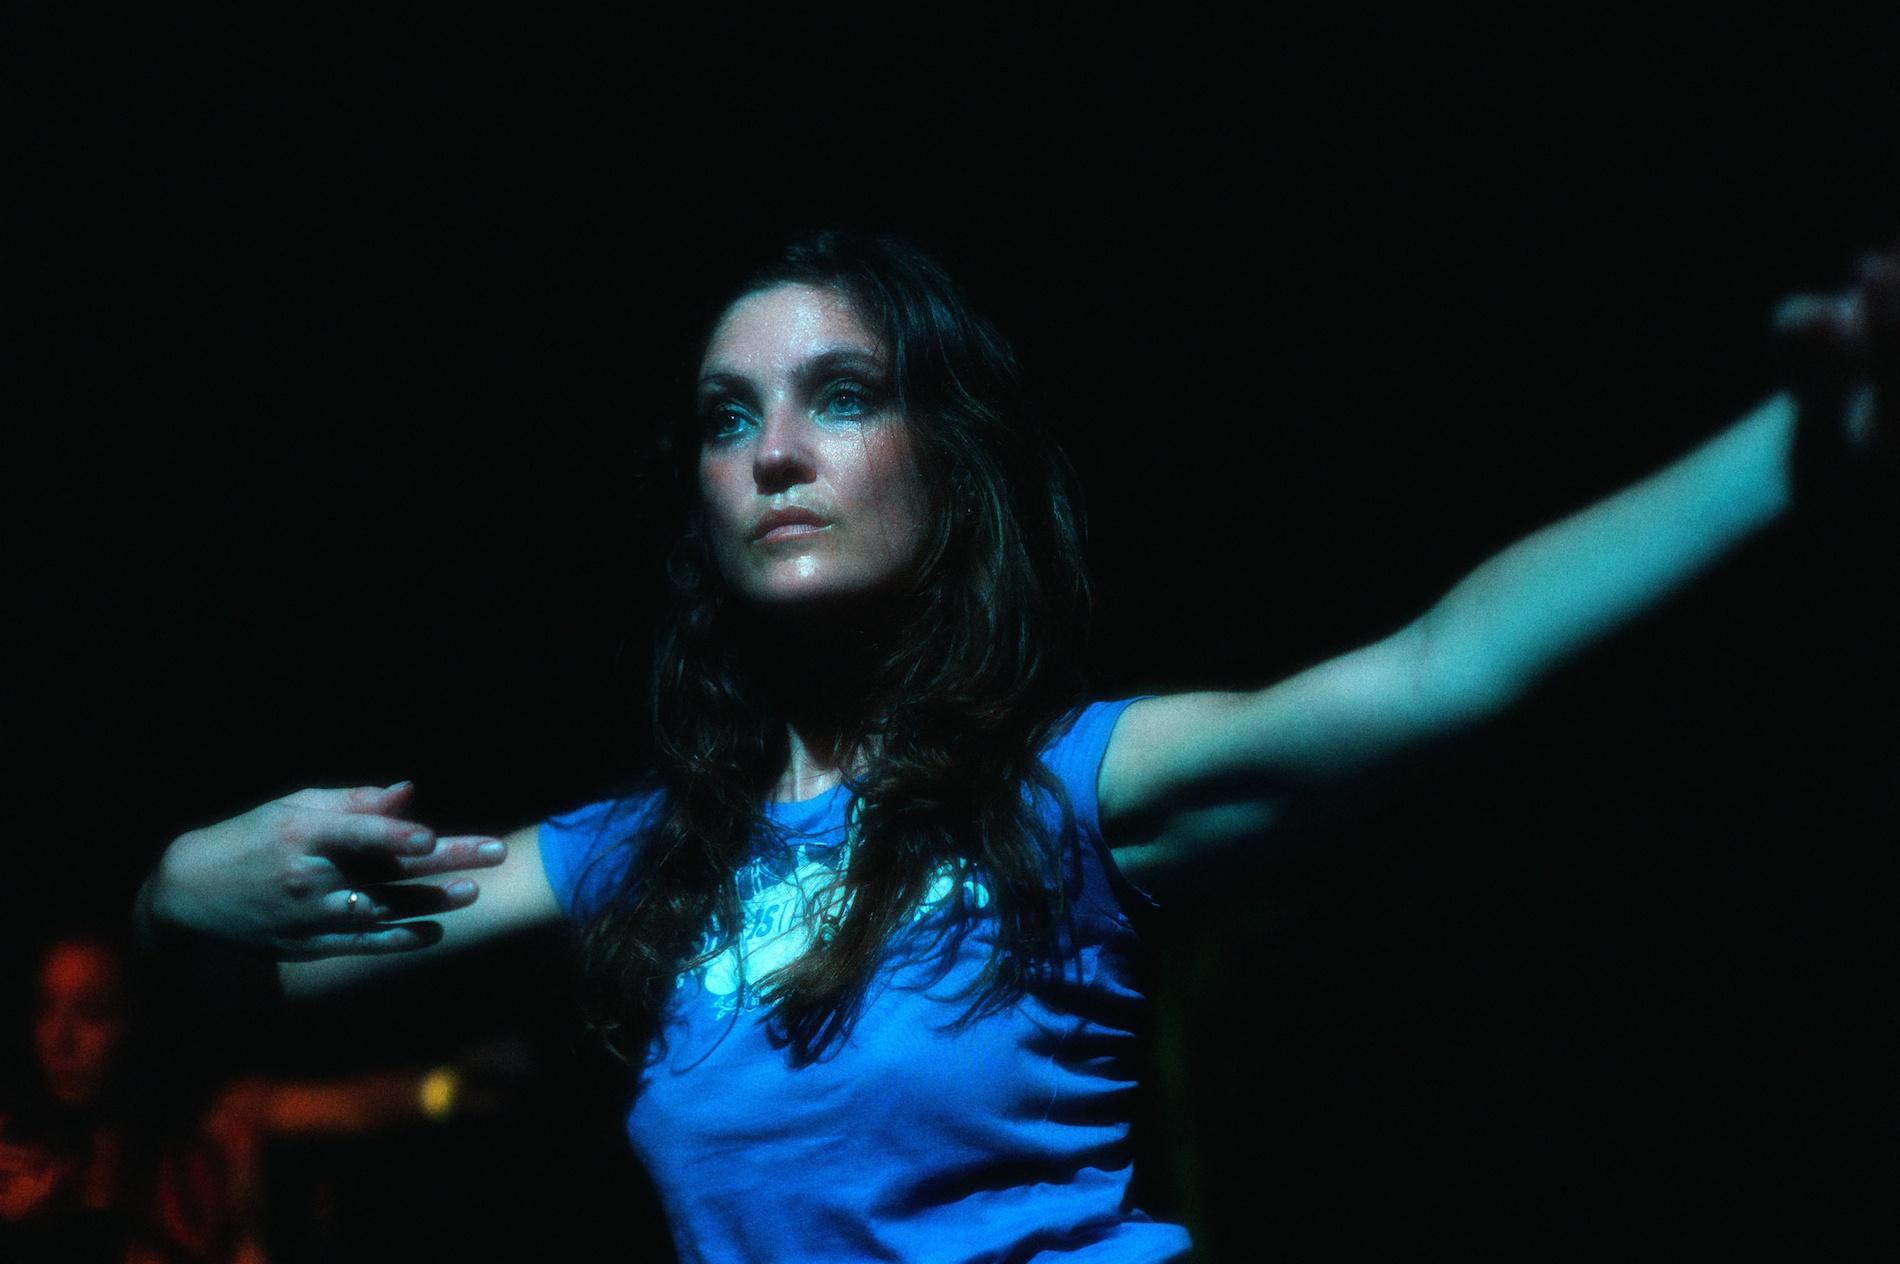 2011-06-02 at 19-44-57, dance.jpg